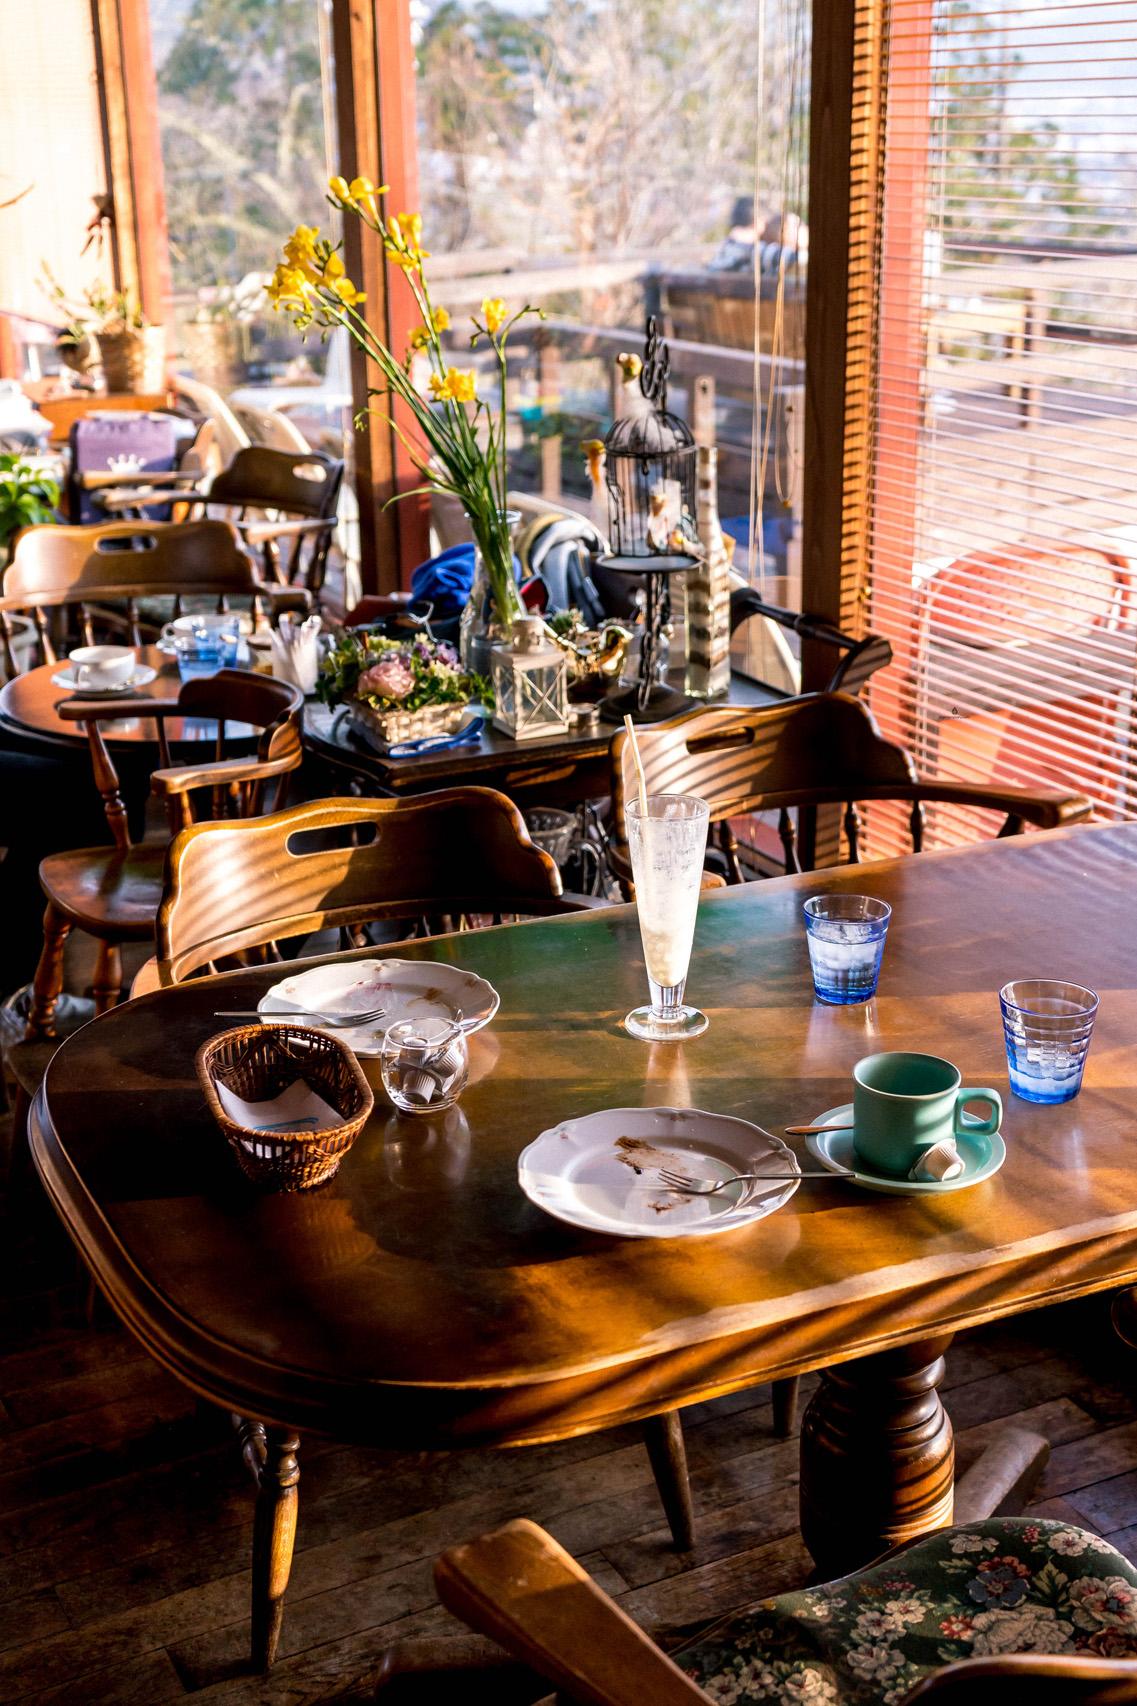 Afternoon sun at Ichii cafe, Takayama